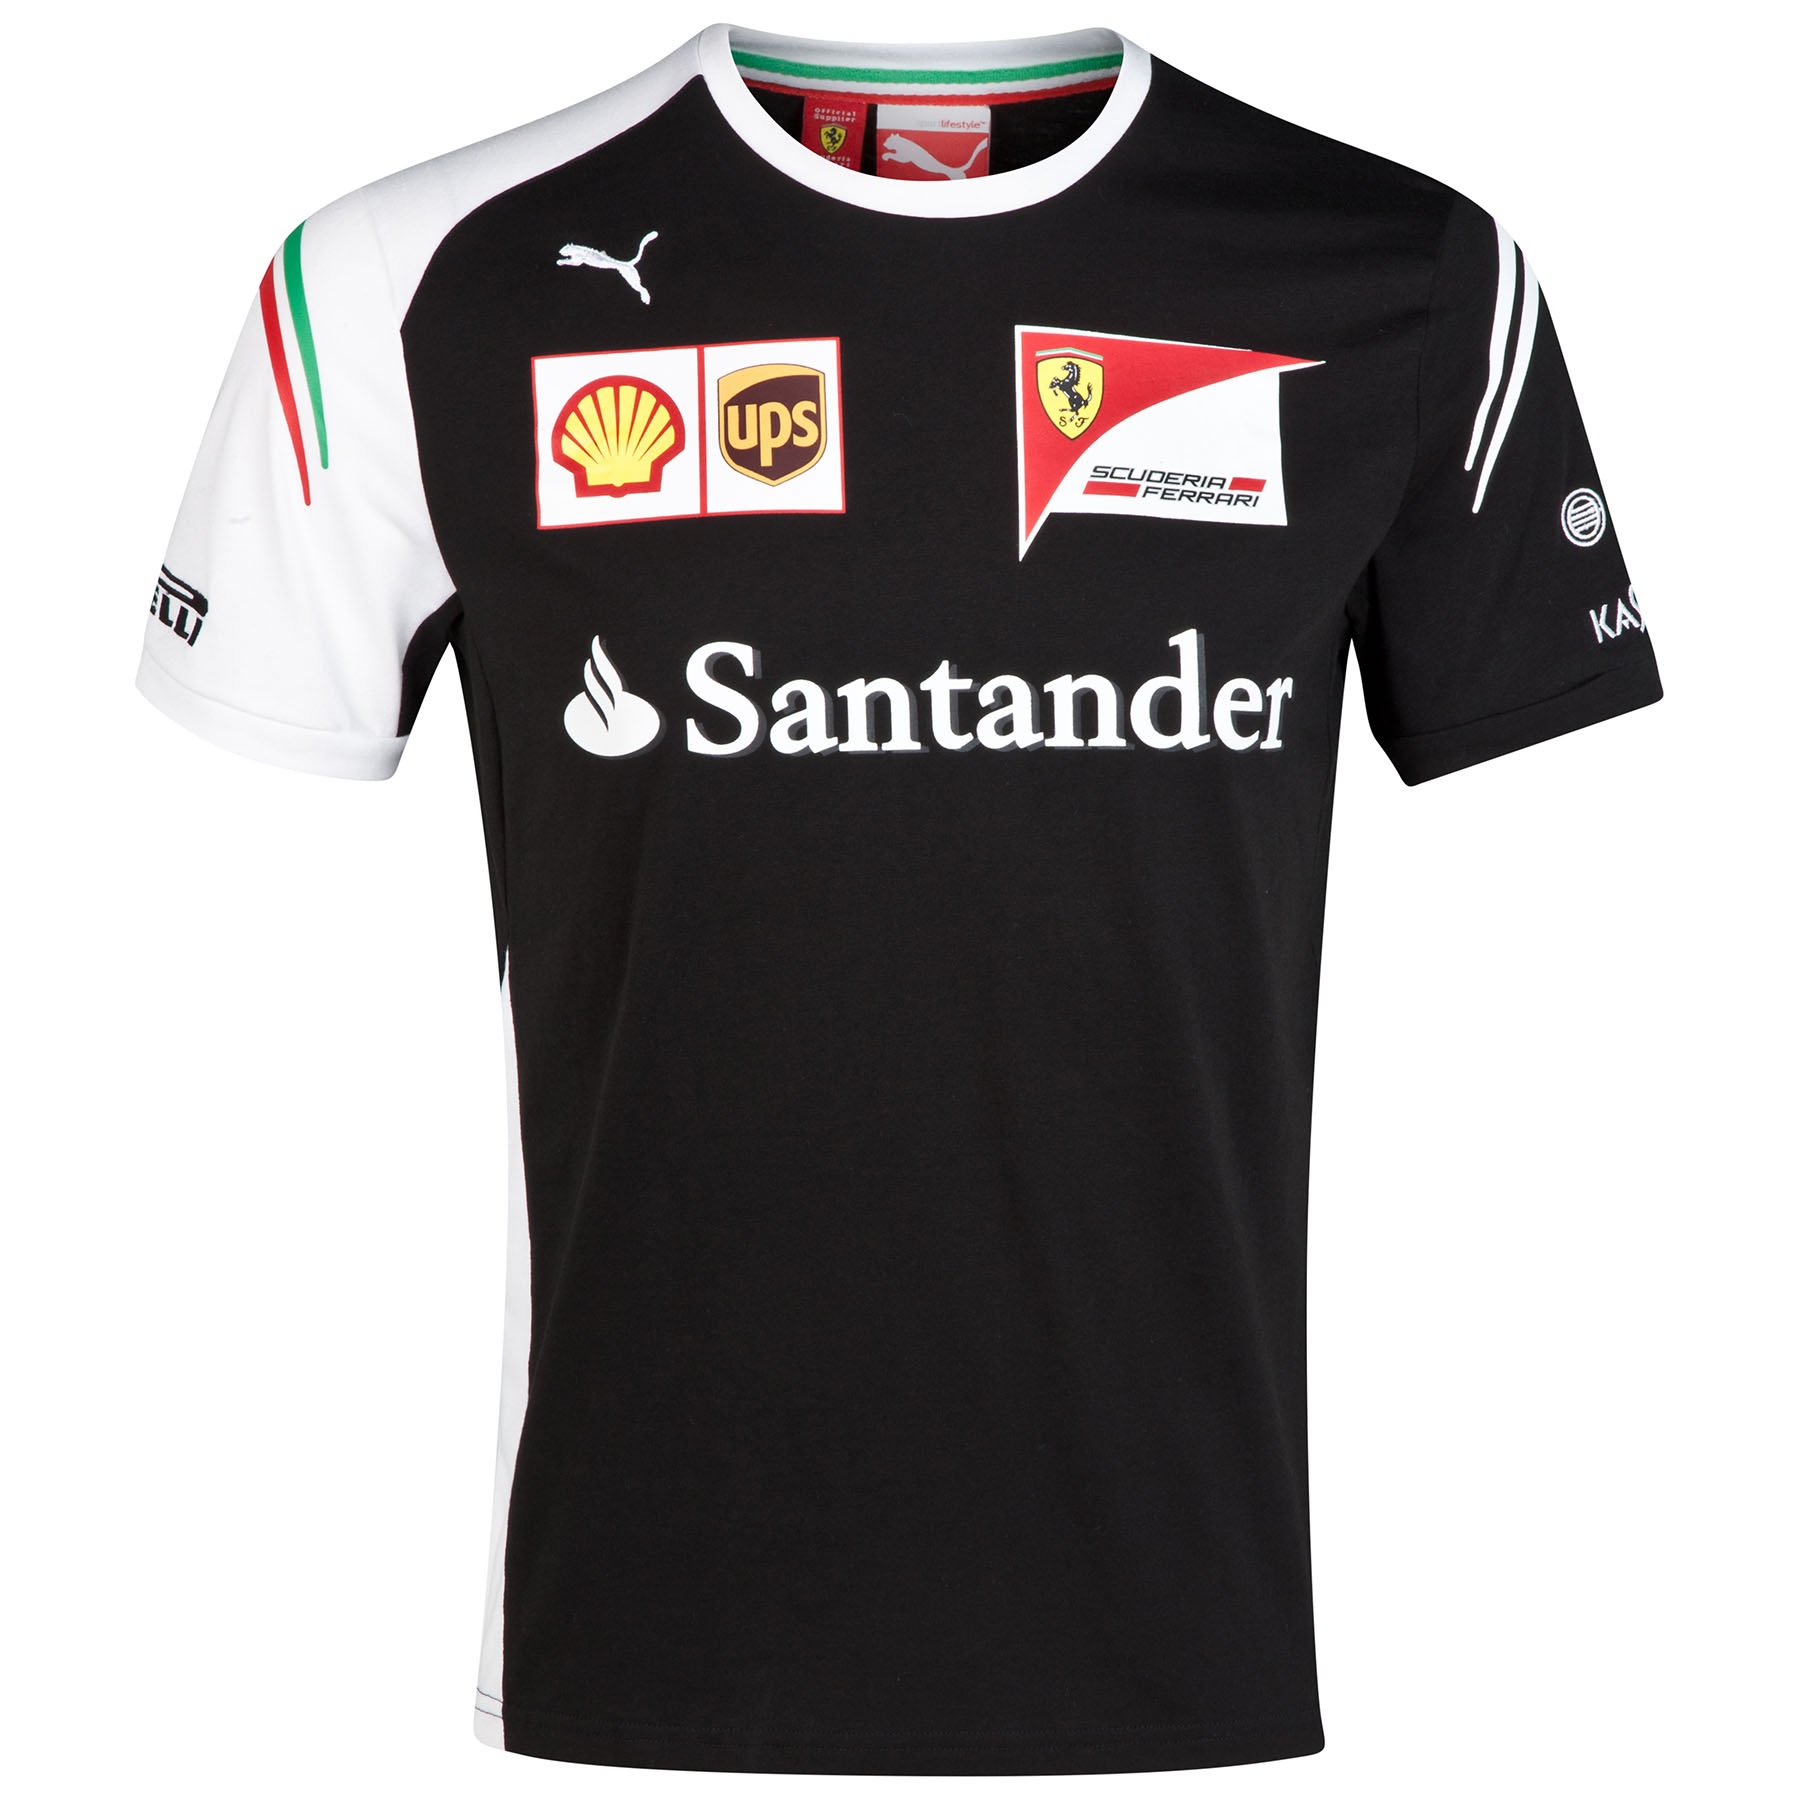 Scuderia Ferrari Team T-Shirt - Black